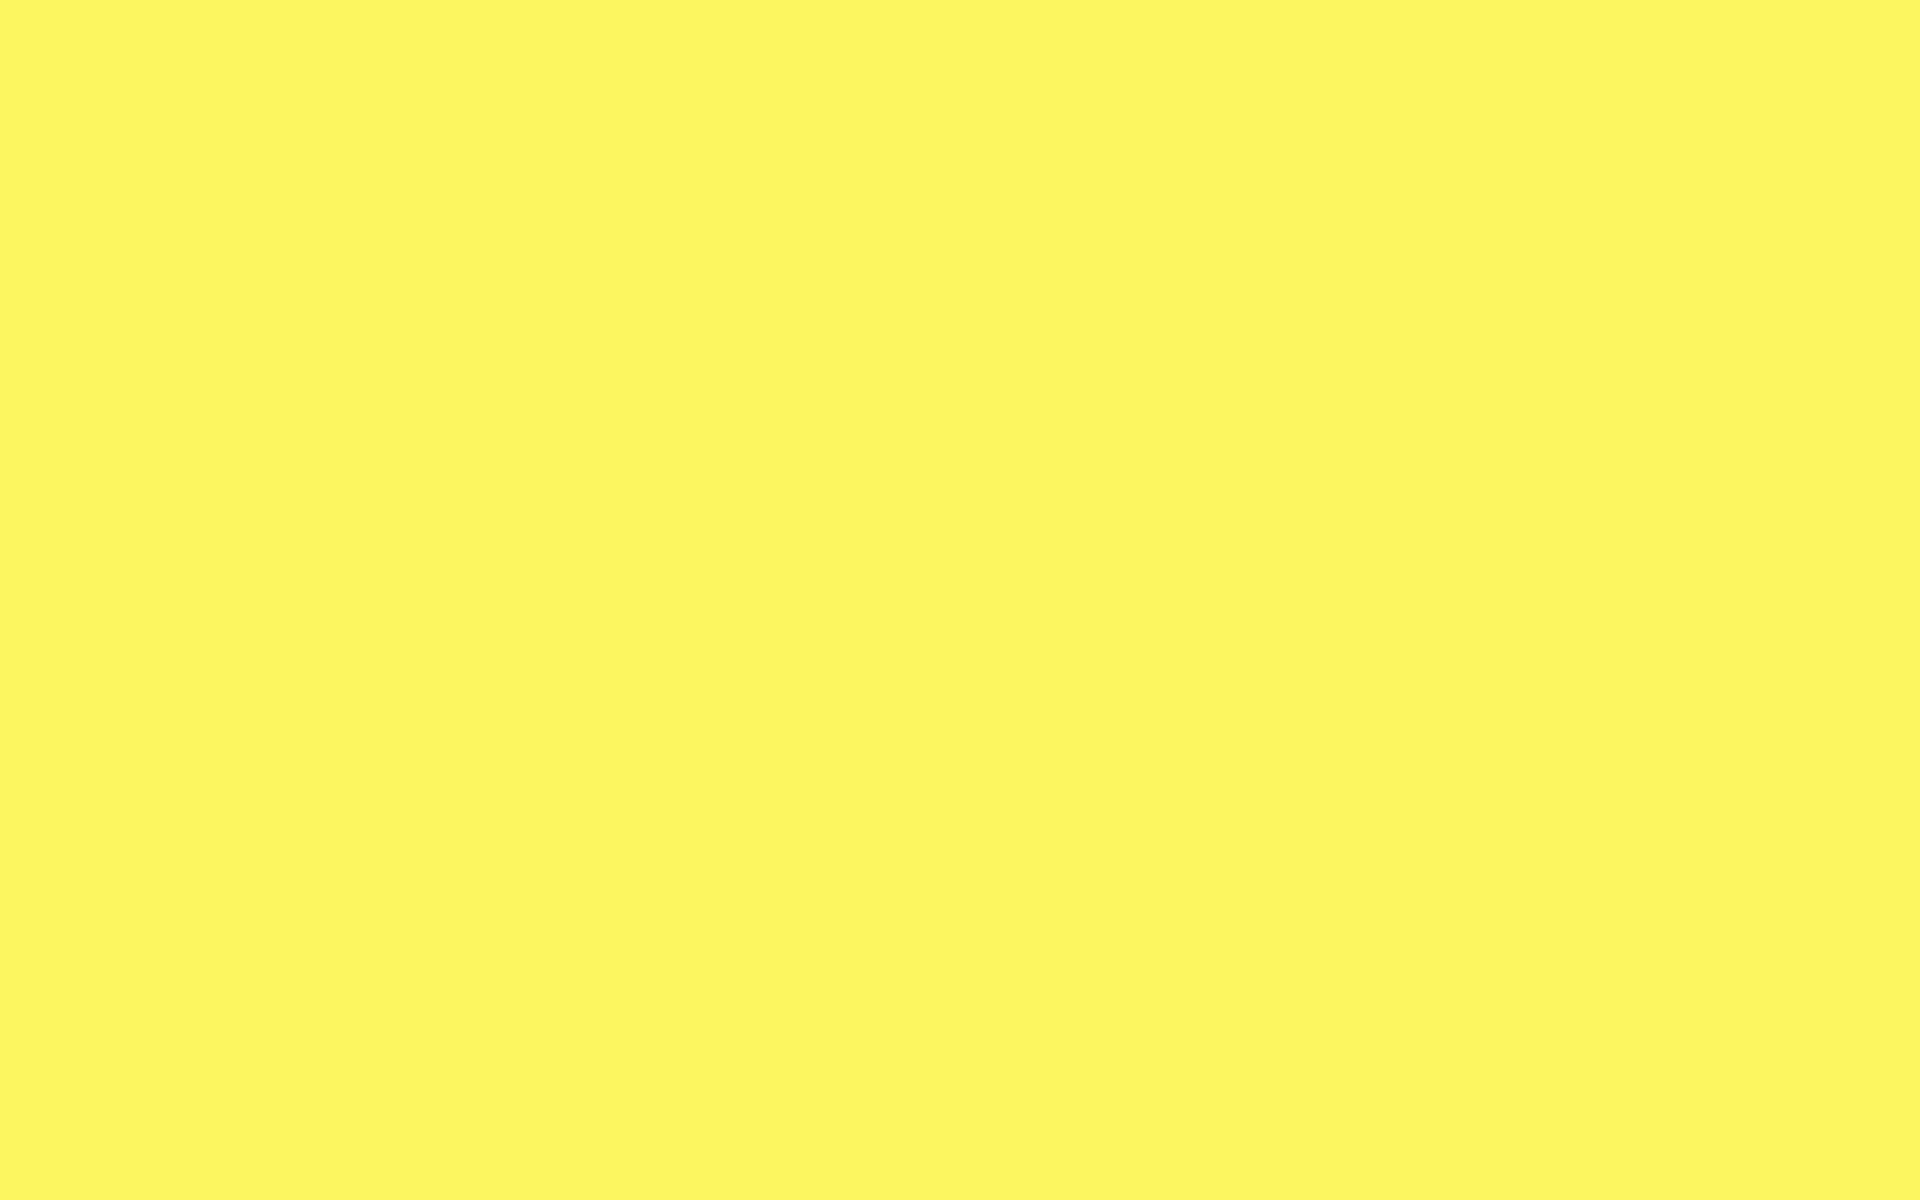 1920x1200 Icterine Solid Color Background